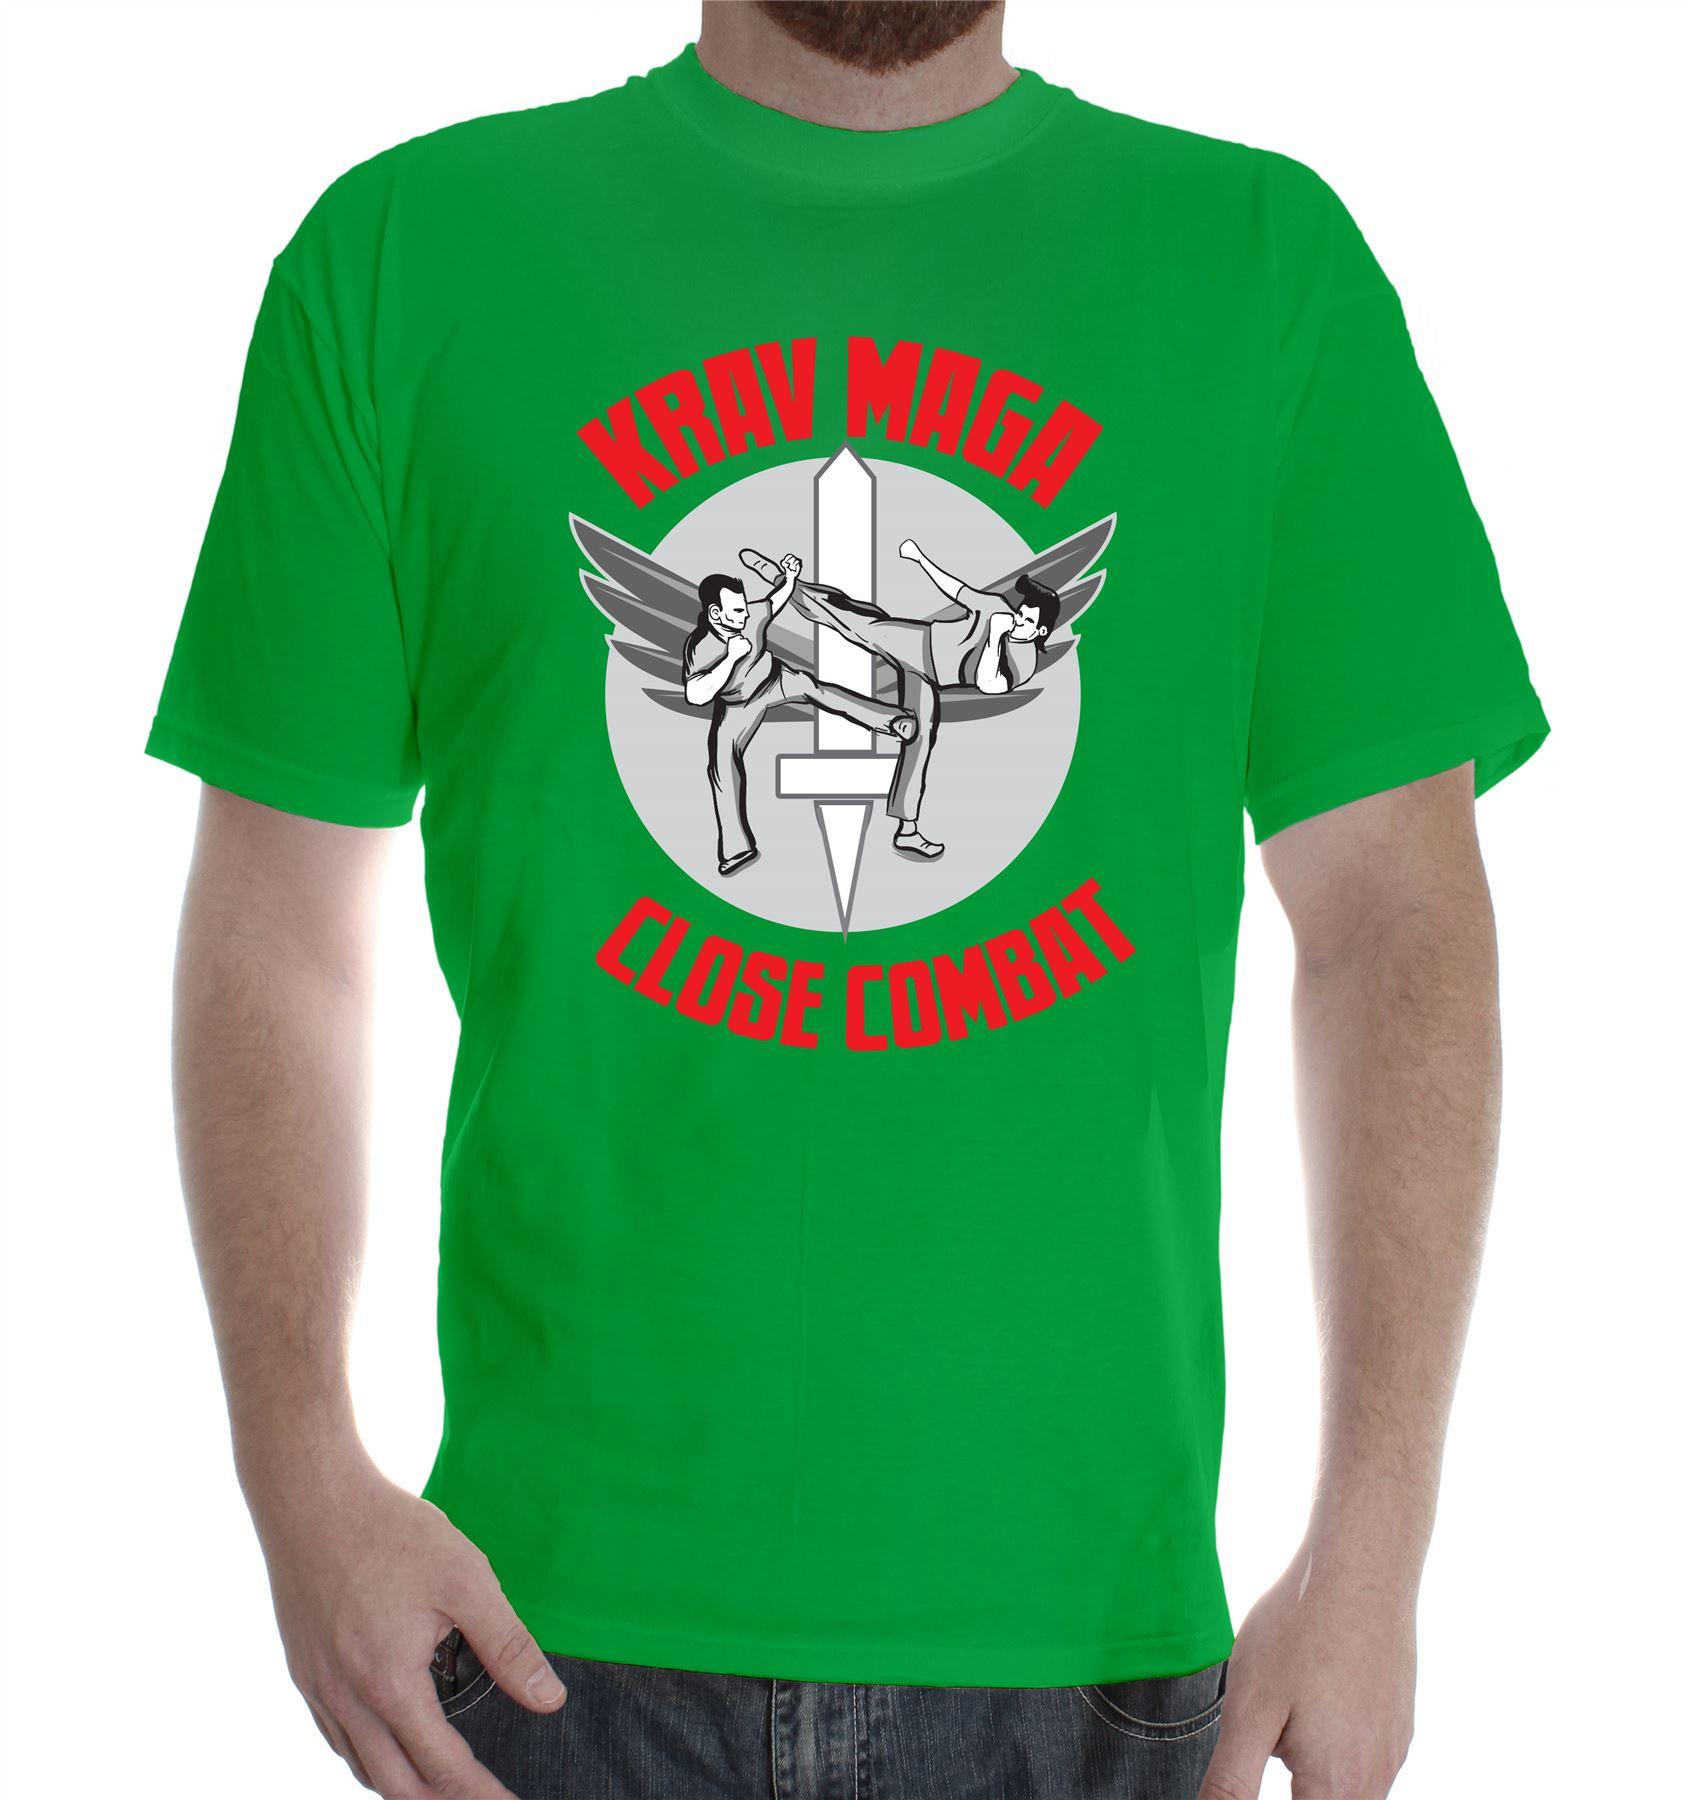 T Shirt Gym Training Combat Wears Krav Maga Mma Fighters